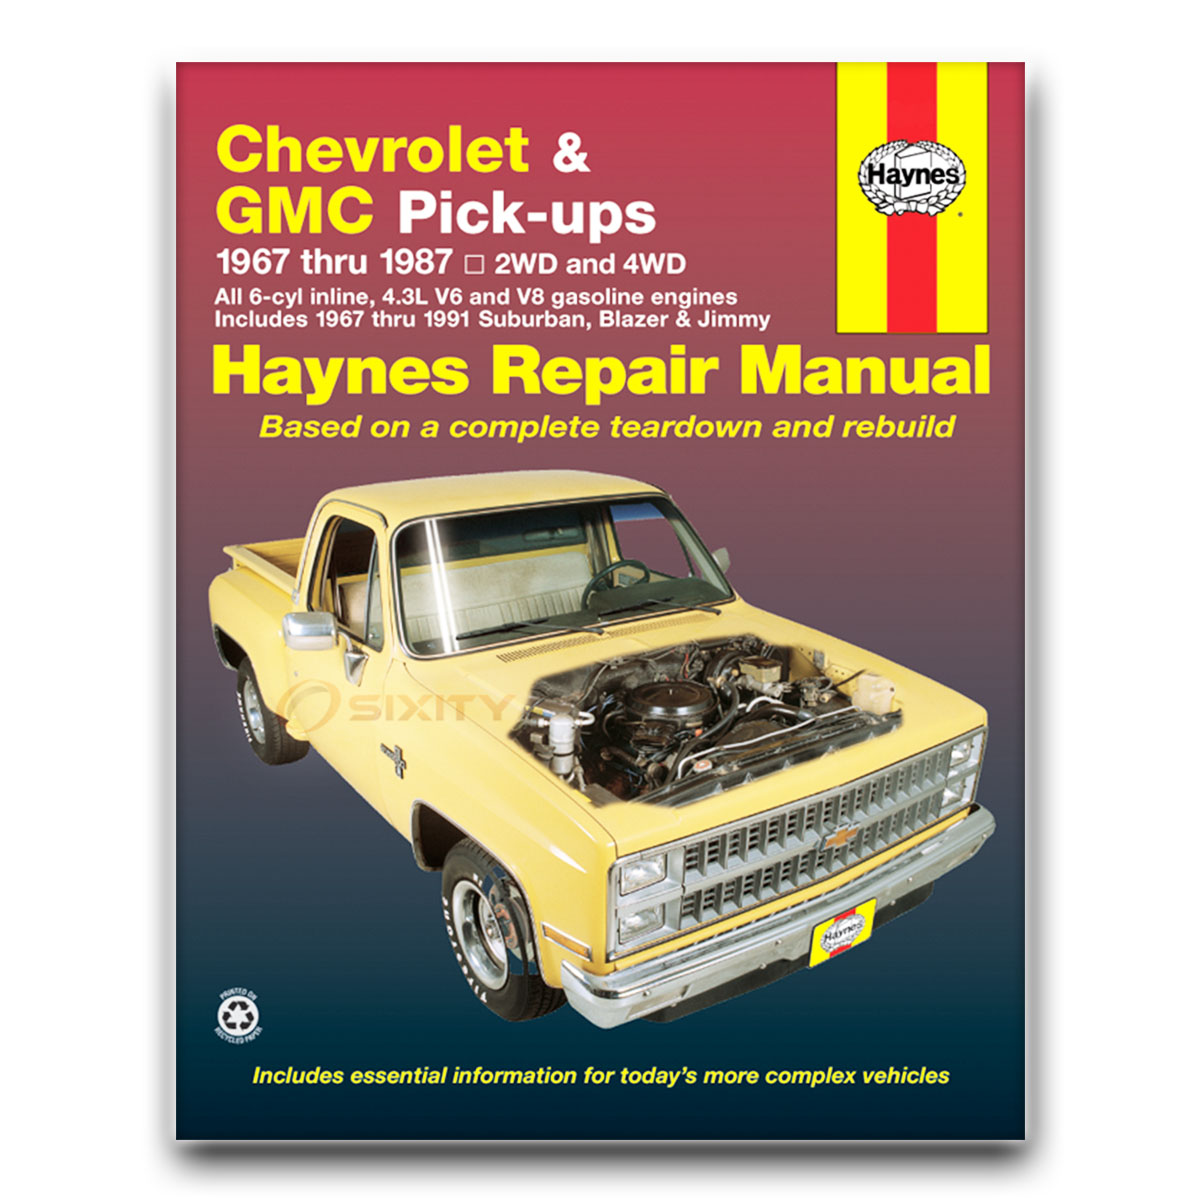 haynes repair manual for chevy k5 blazer deluxe silverado scottsdale rh  ebay com 1995 Geo Prizm 1996 Geo Prizm